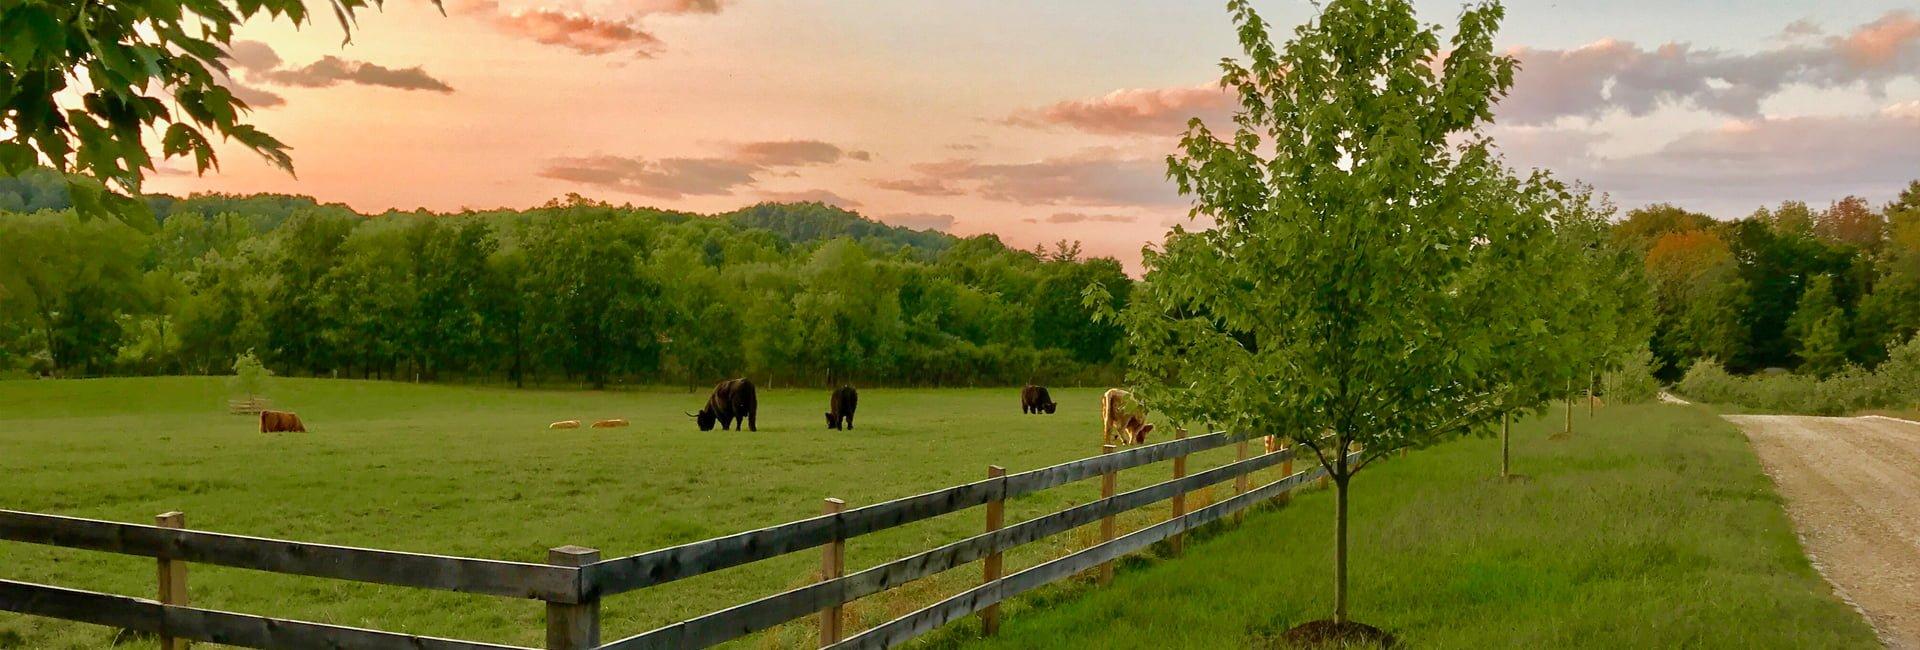 June Farms, Scottish Highland Cattle grazing_Capital-Saratoga Region